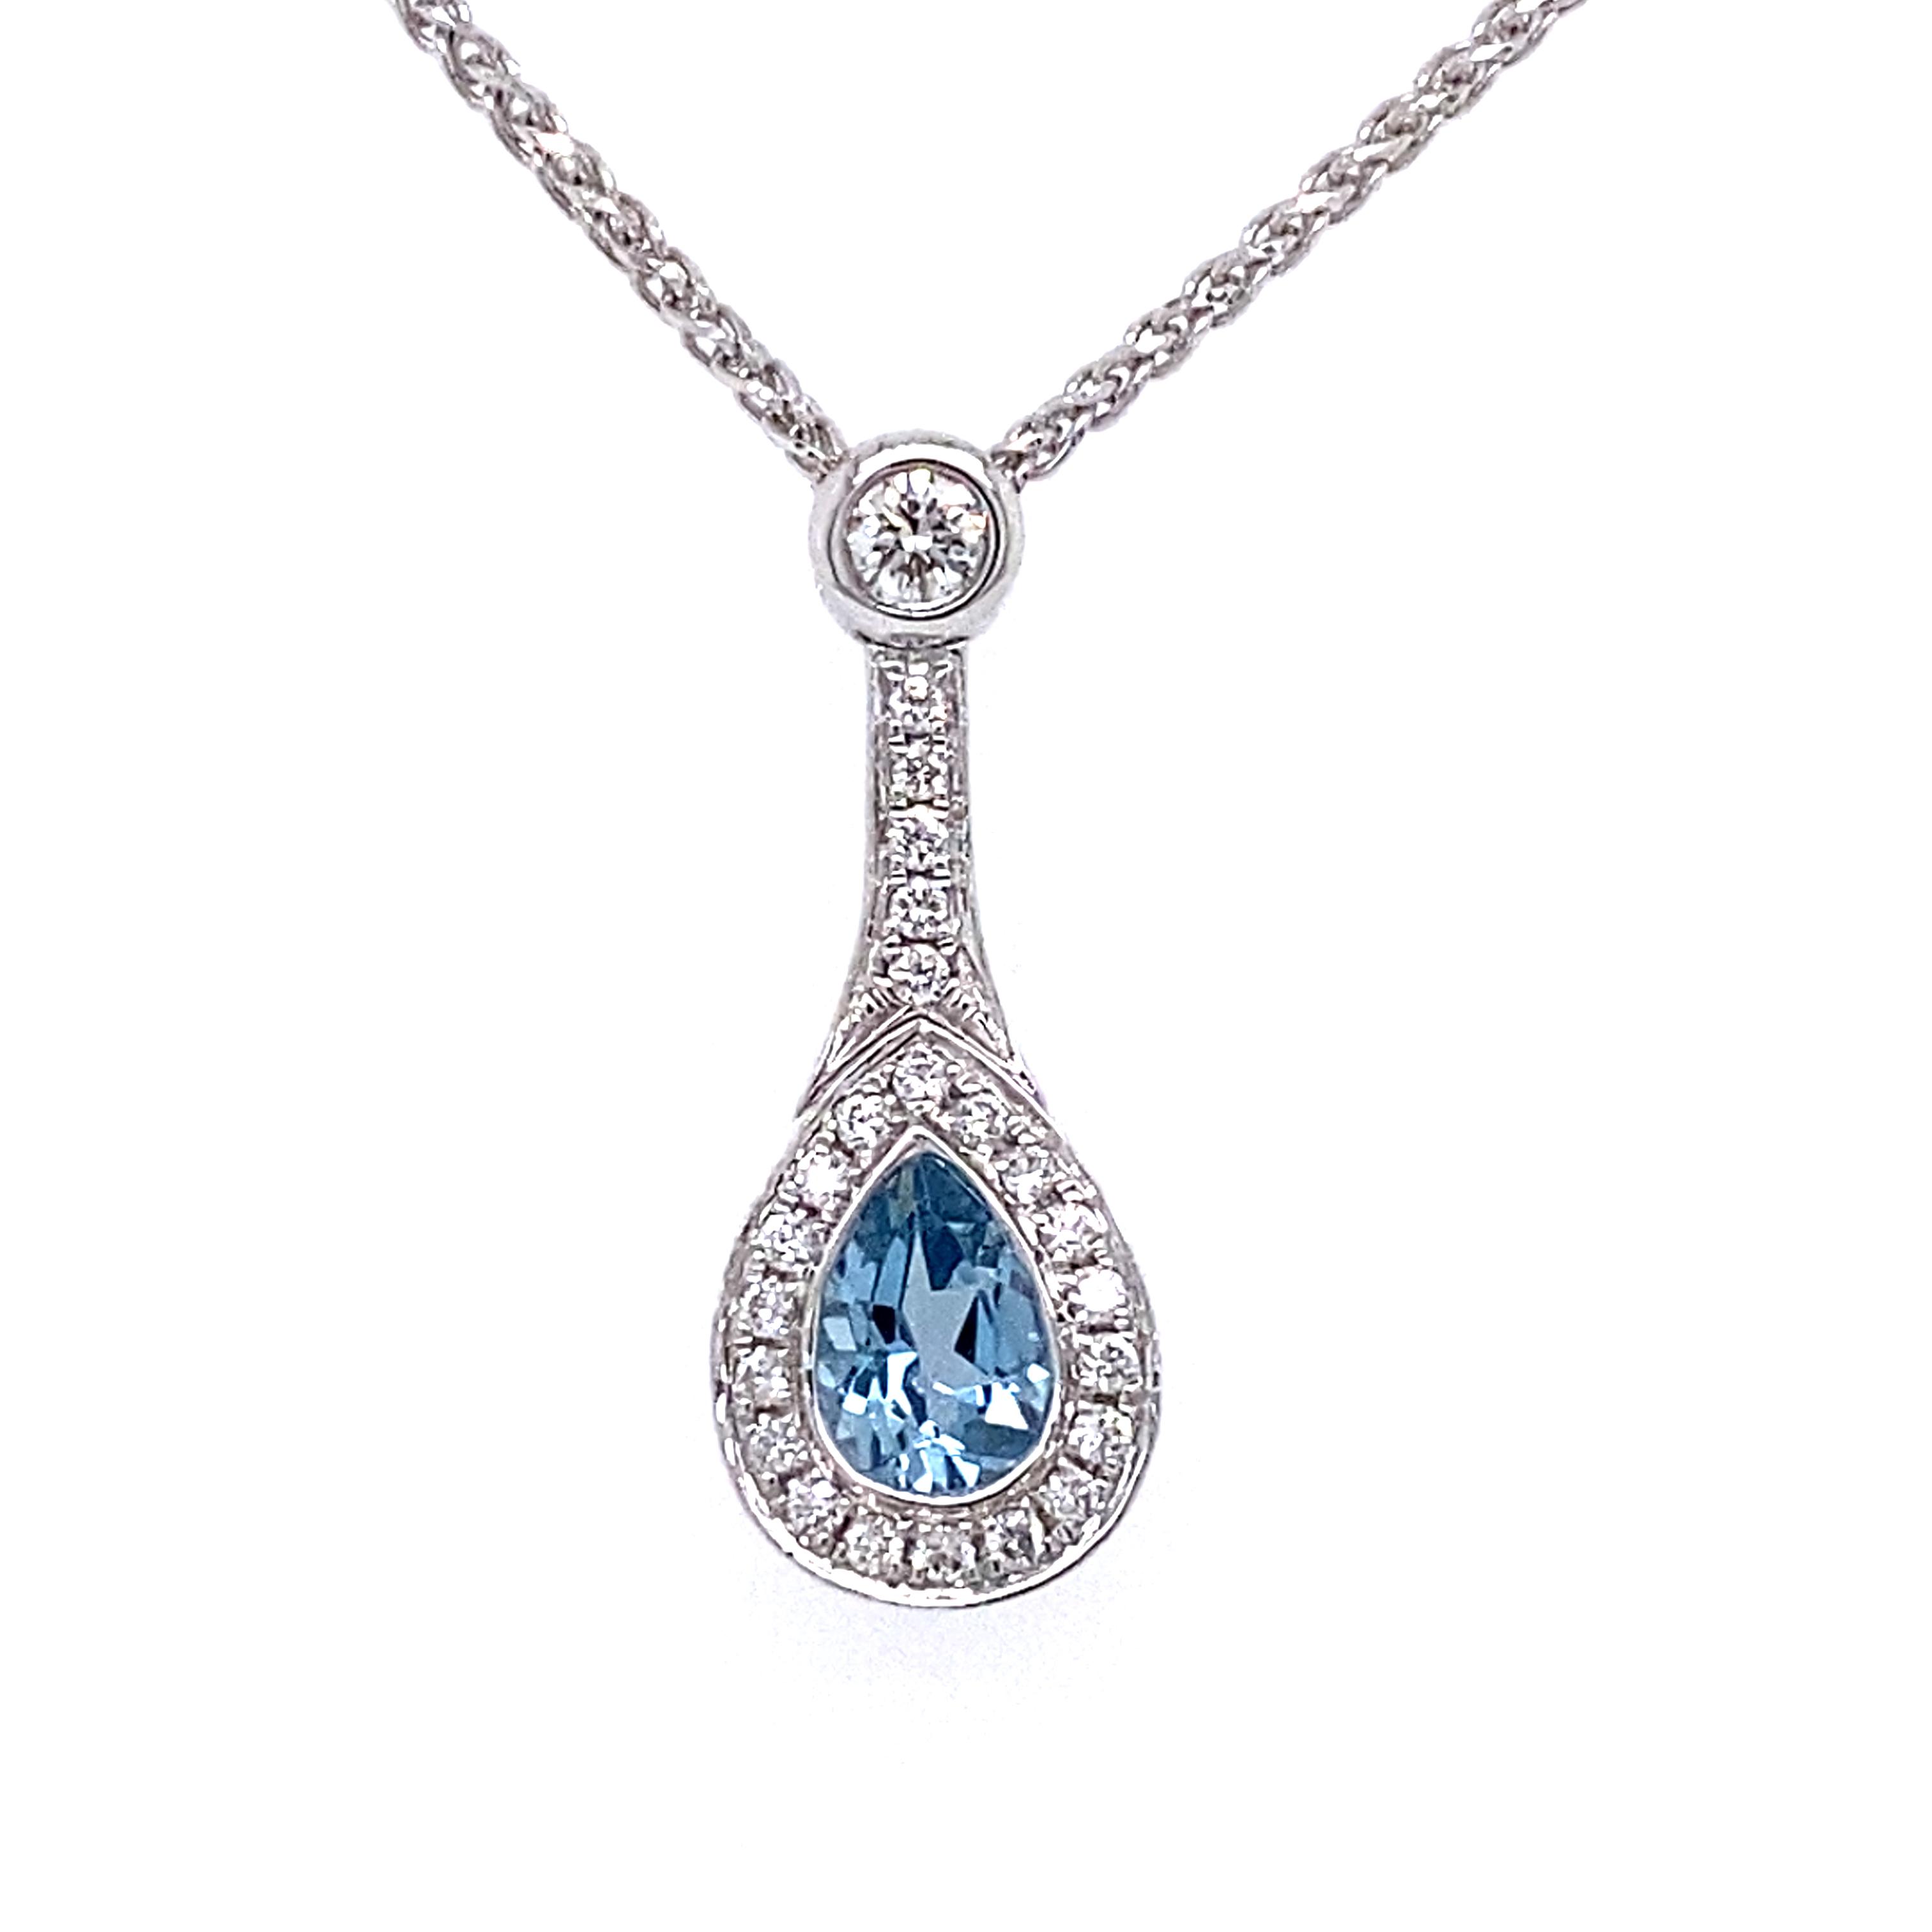 18 Carat White Gold Pear Shape Aquamarine and Diamond Pendant